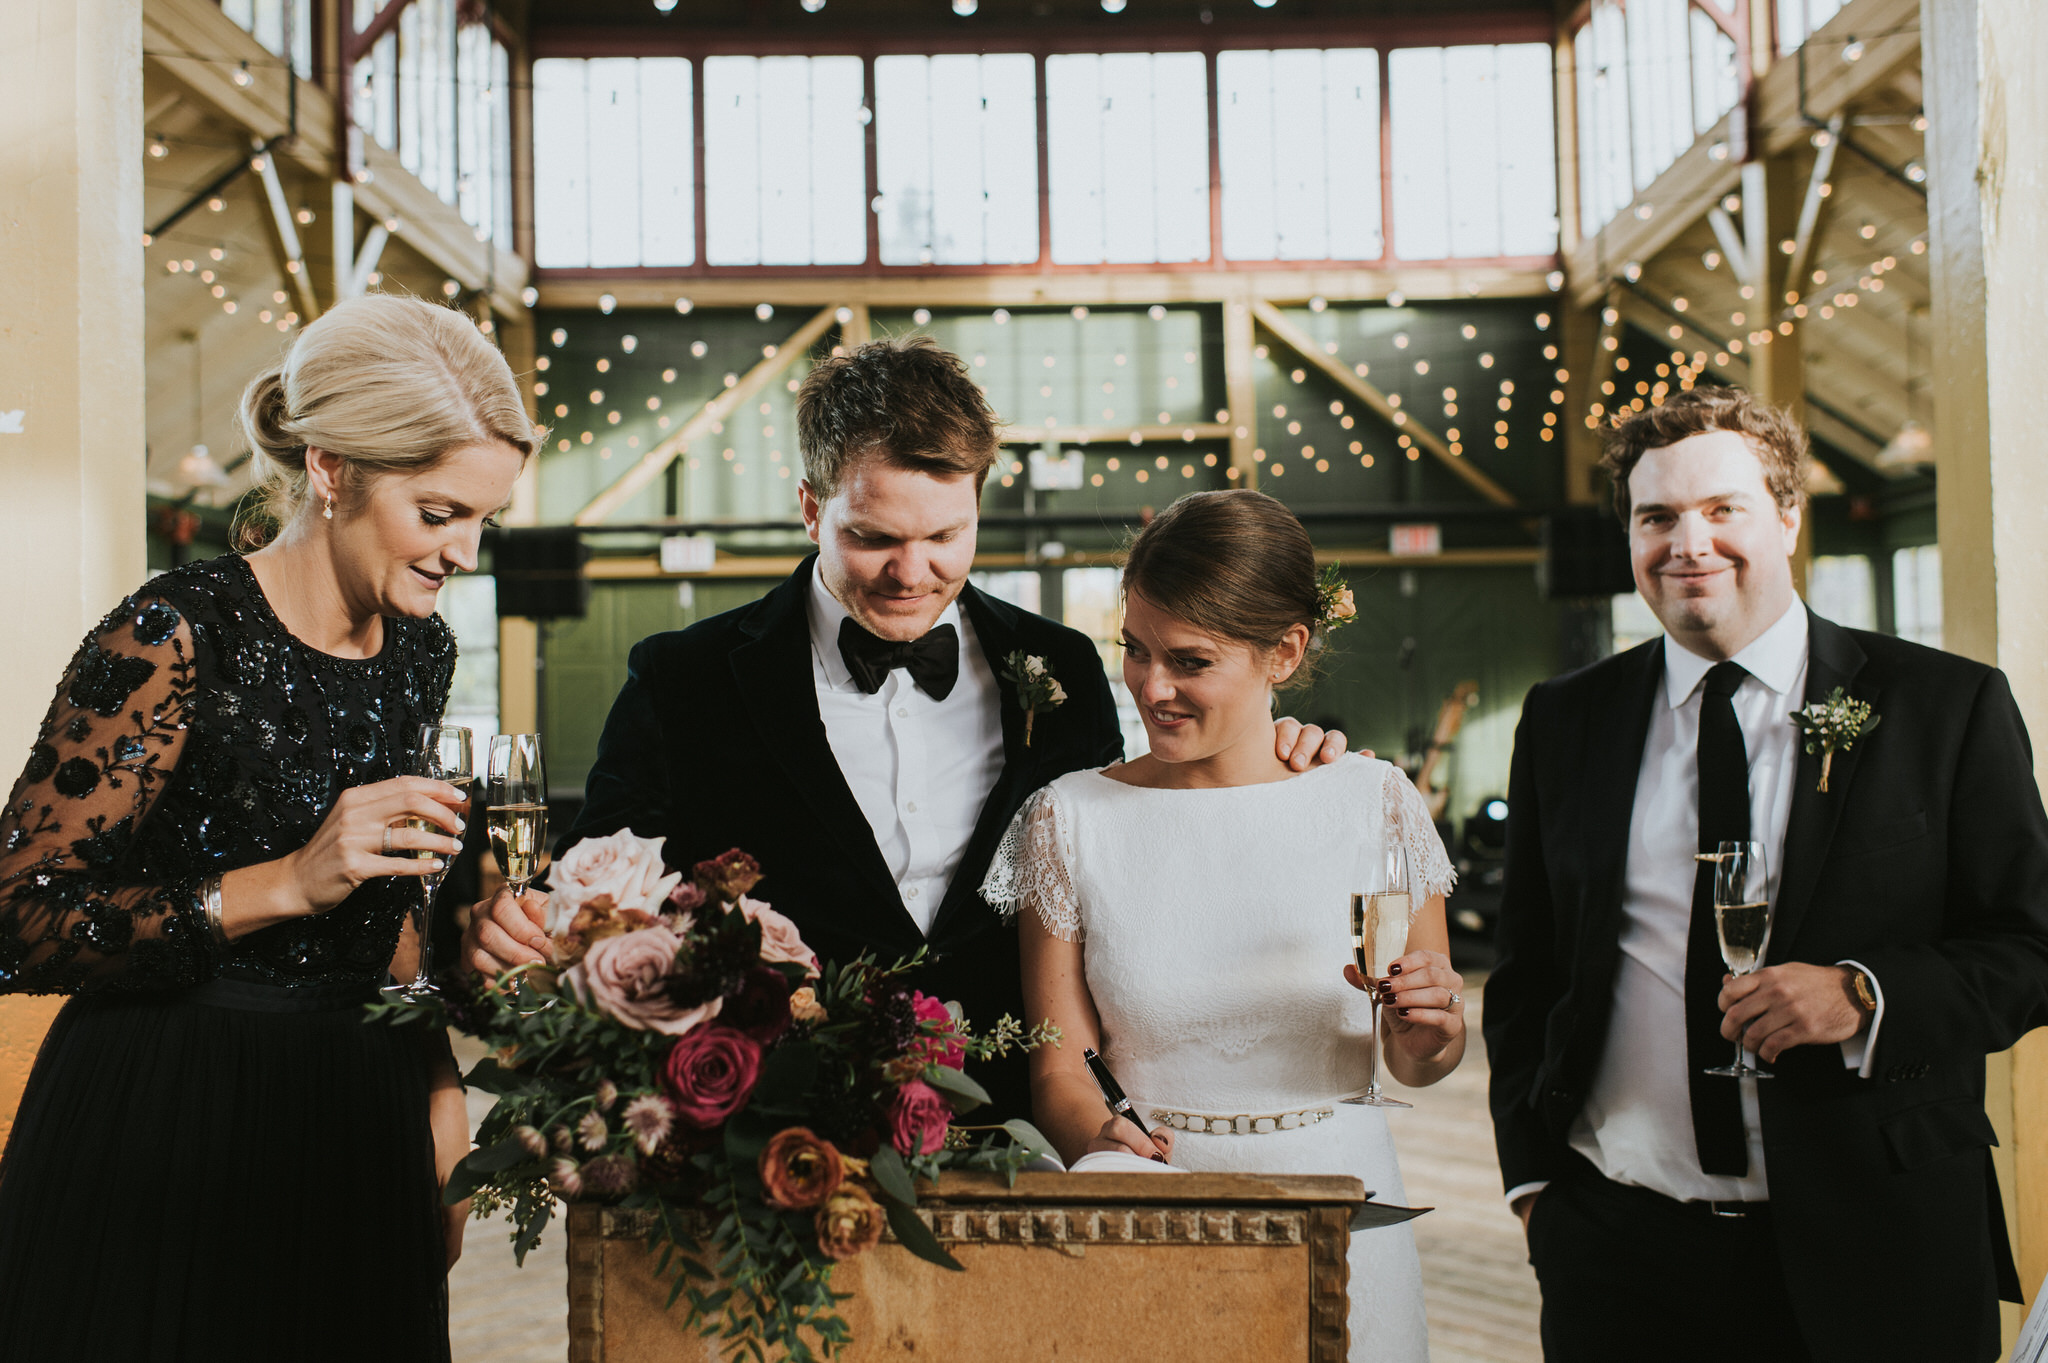 scarletoneillphotography_weddingphotography_prince edward county weddings125.JPG